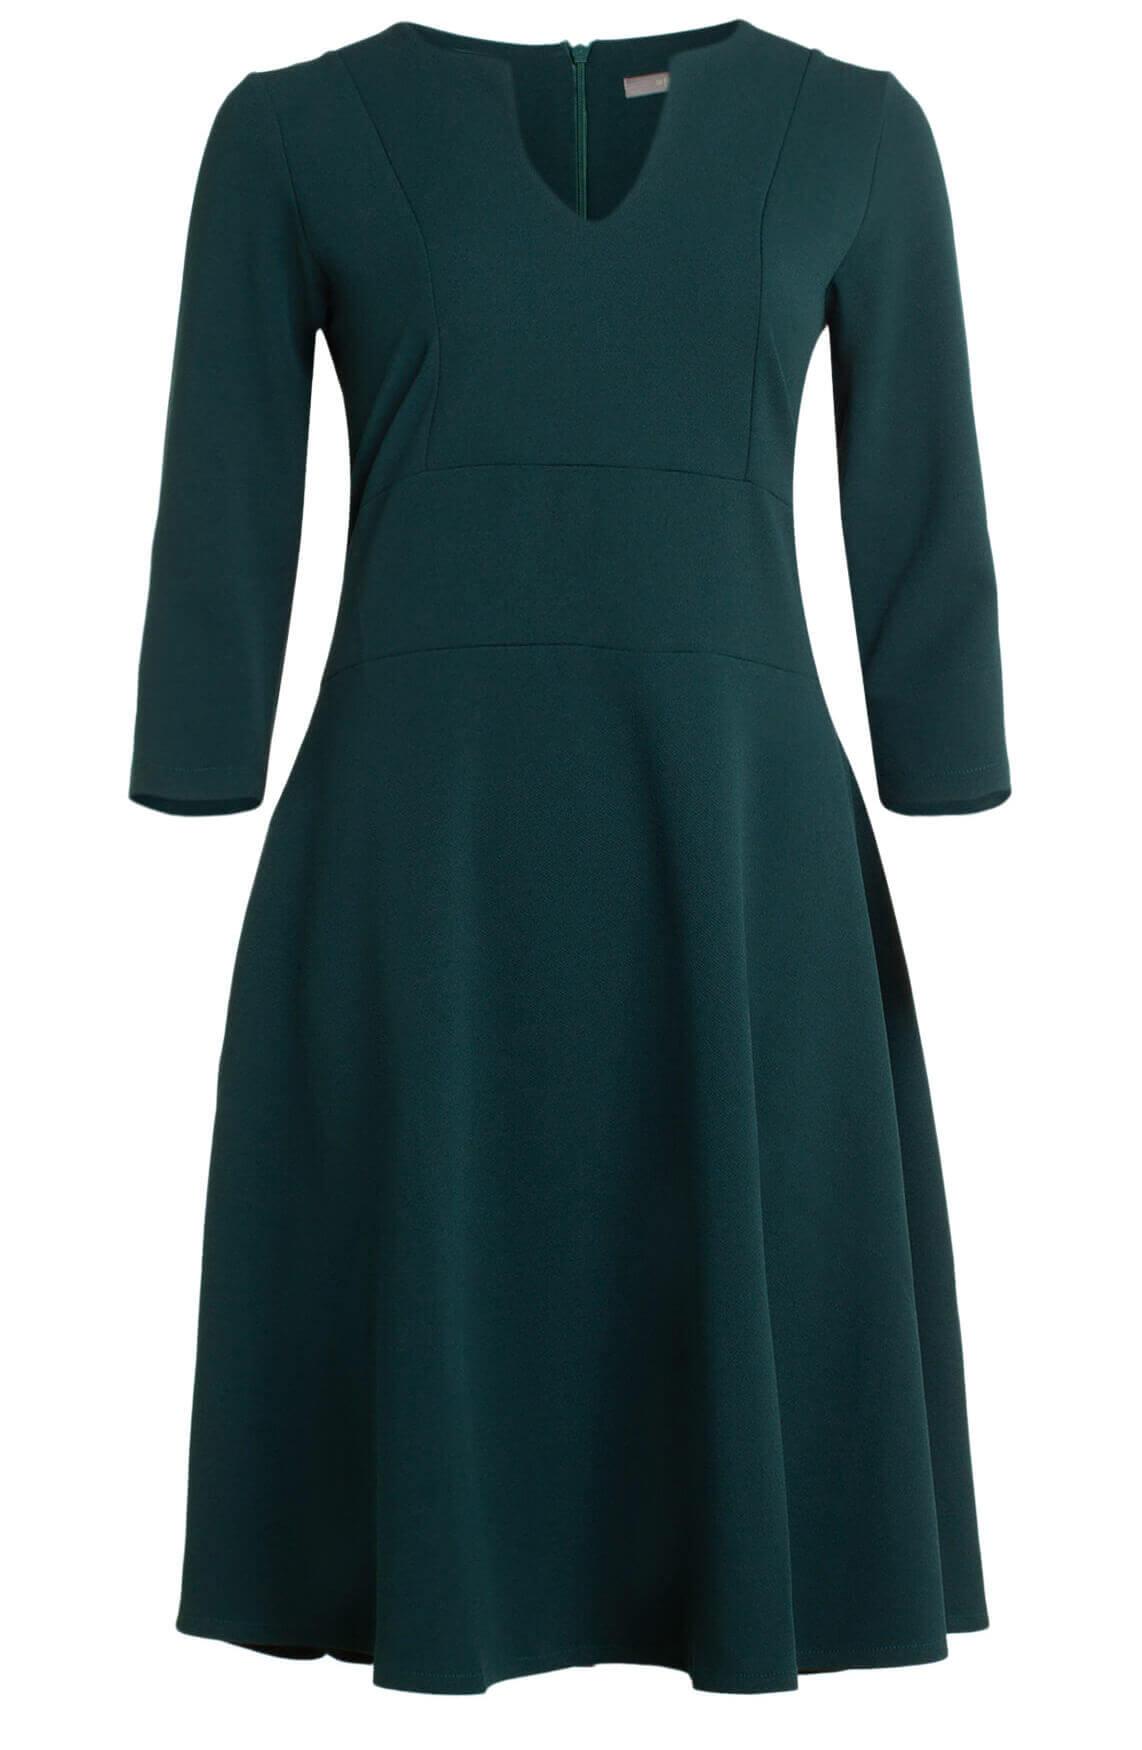 La Fée Maraboutée Dames A-lijn jurk groen